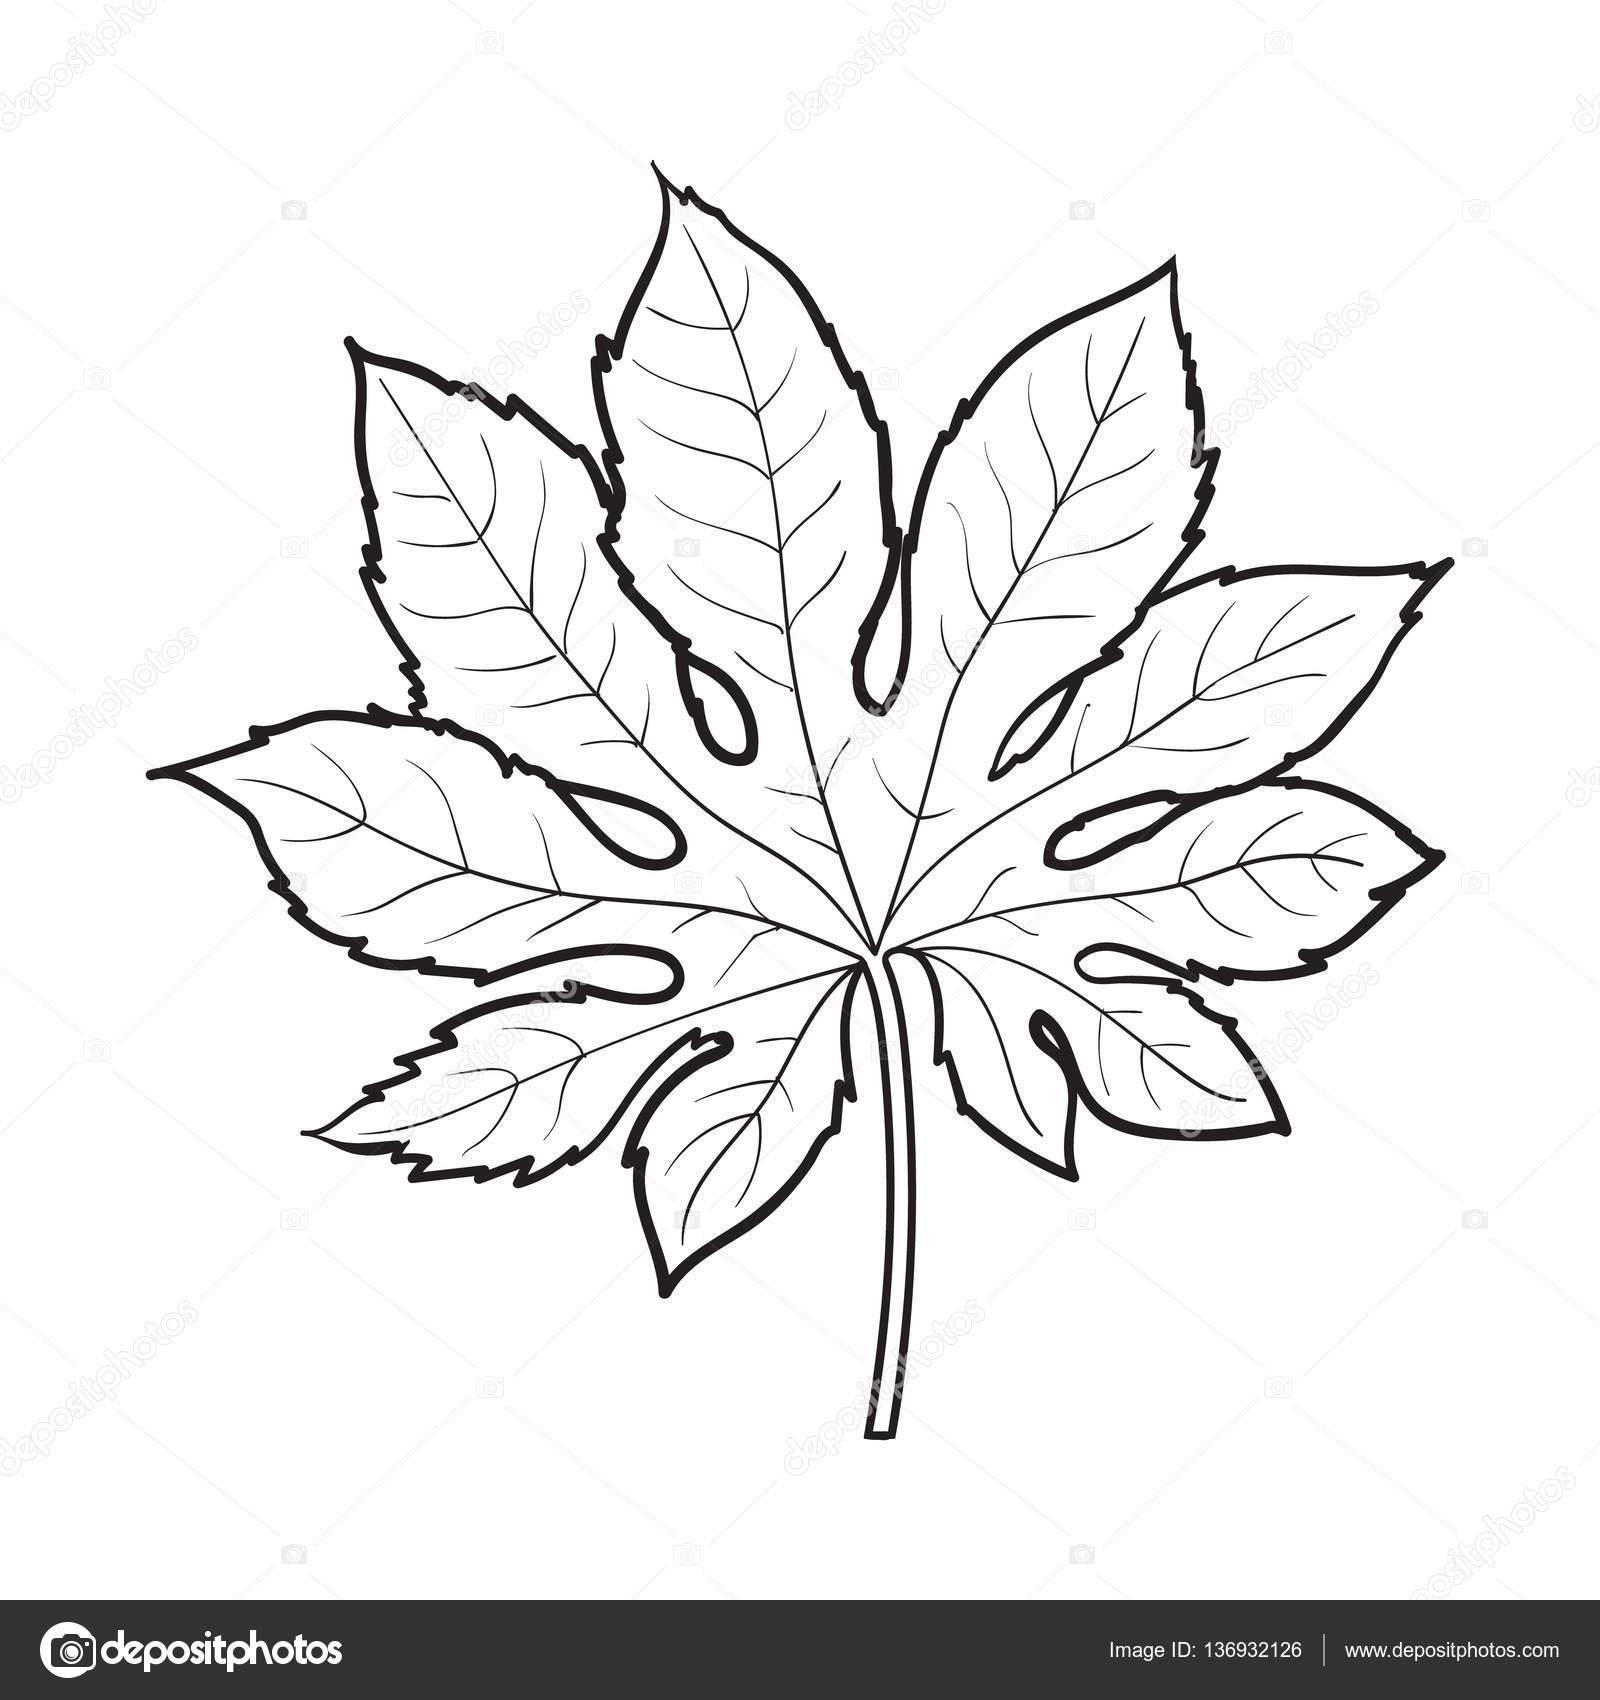 1600x1700 Full Leaf Of Fatsia Japonica Palm Tree, Sketch Vector Illustration